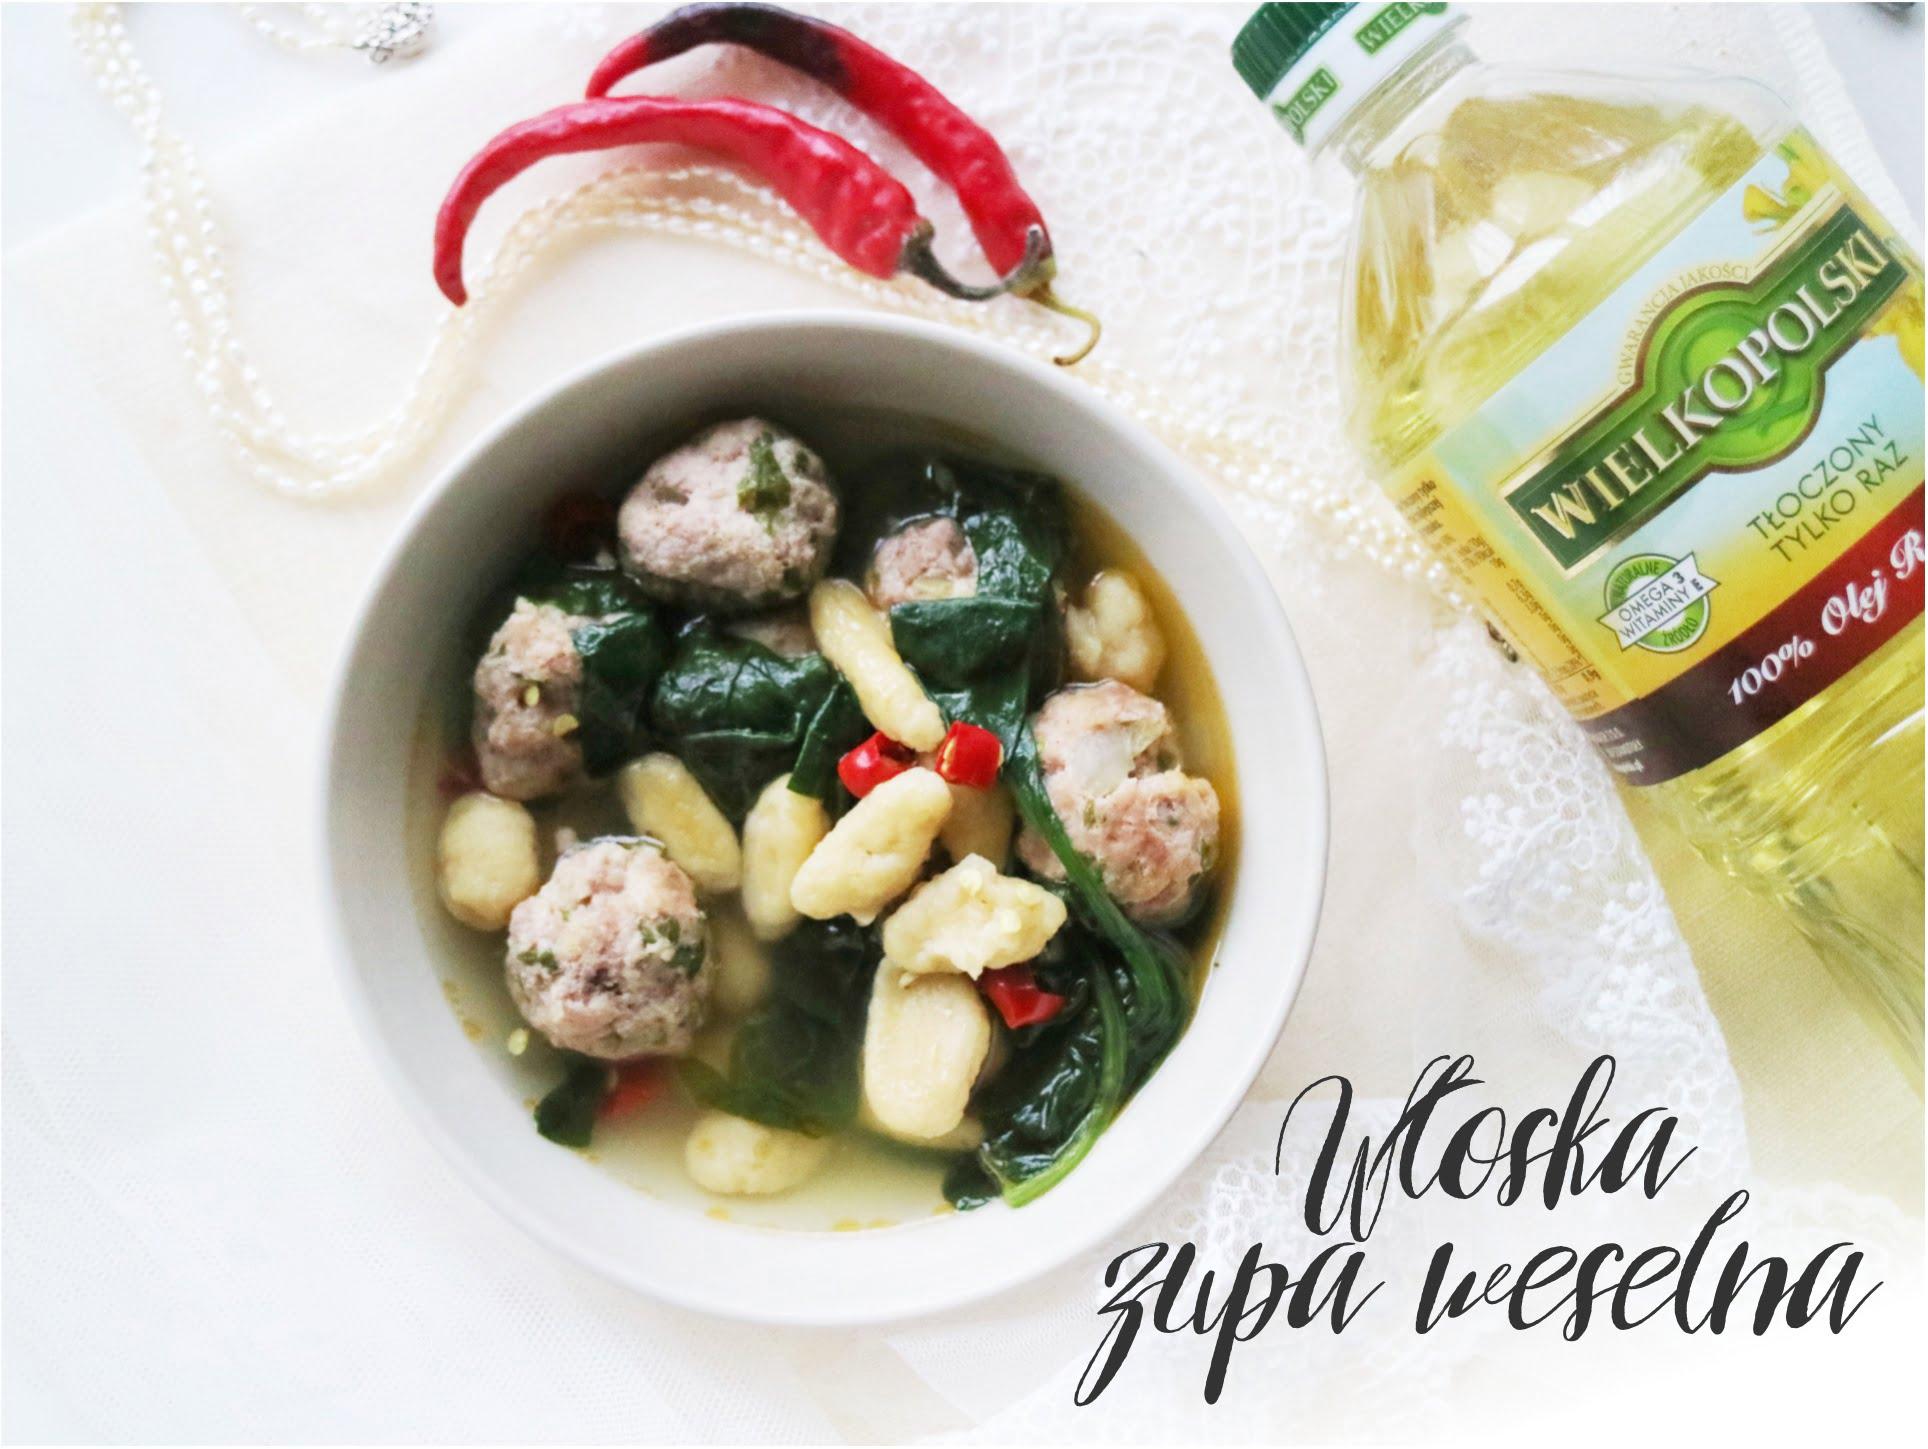 włoska zupa weselna minestra maritata